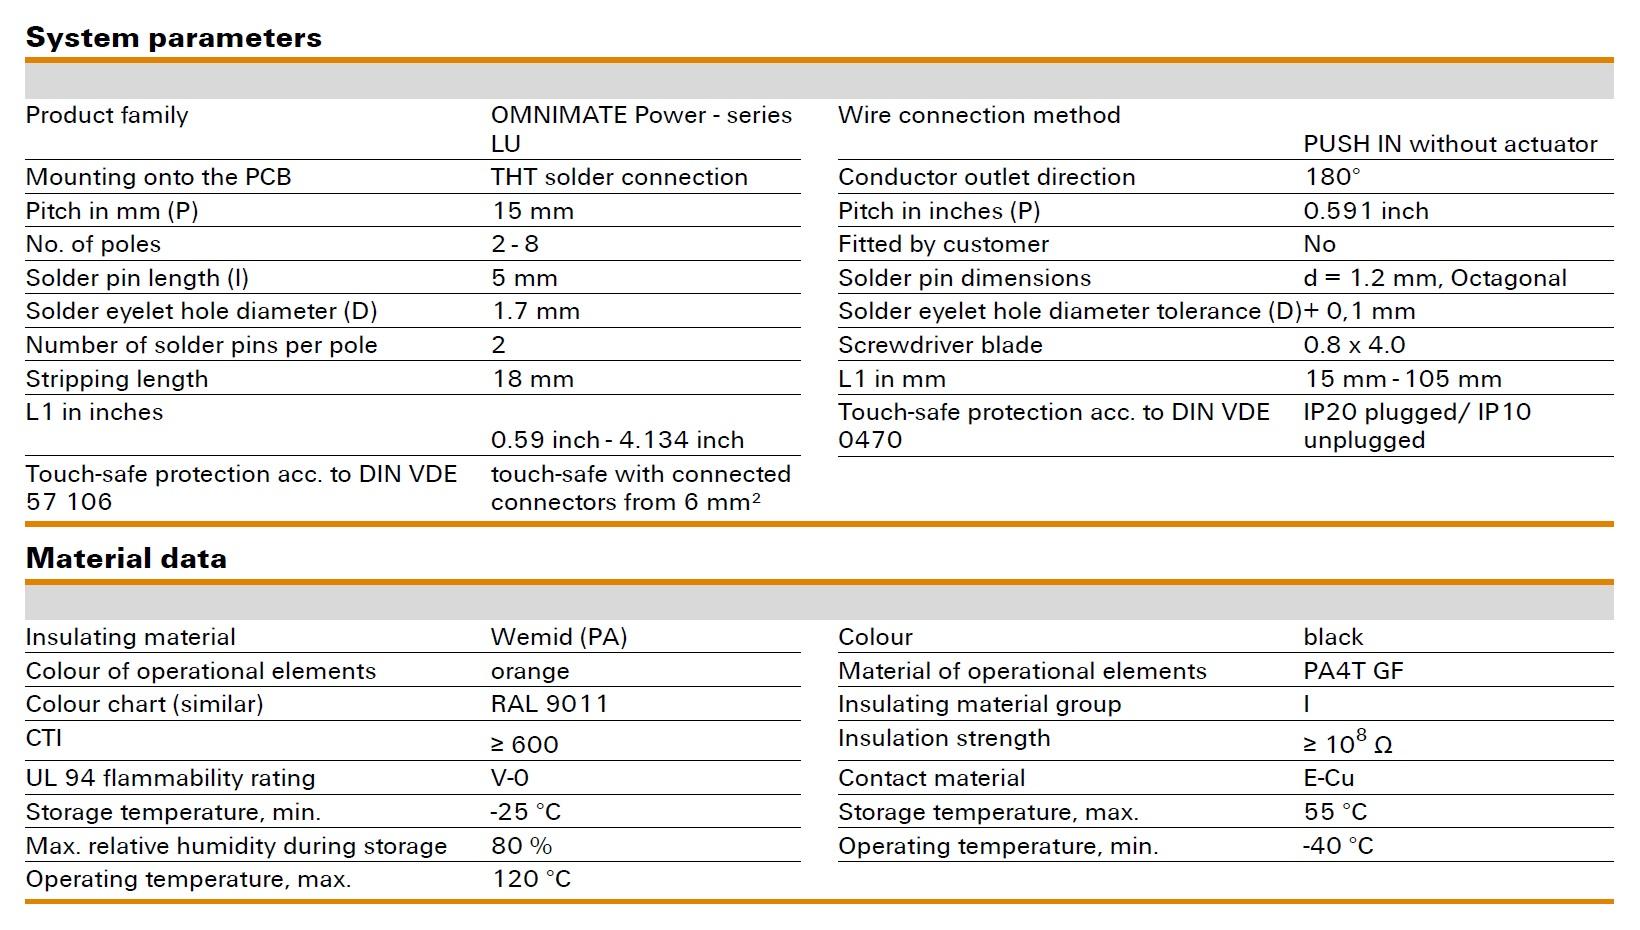 Weidmüller LUFS 15.00/180V Specifications